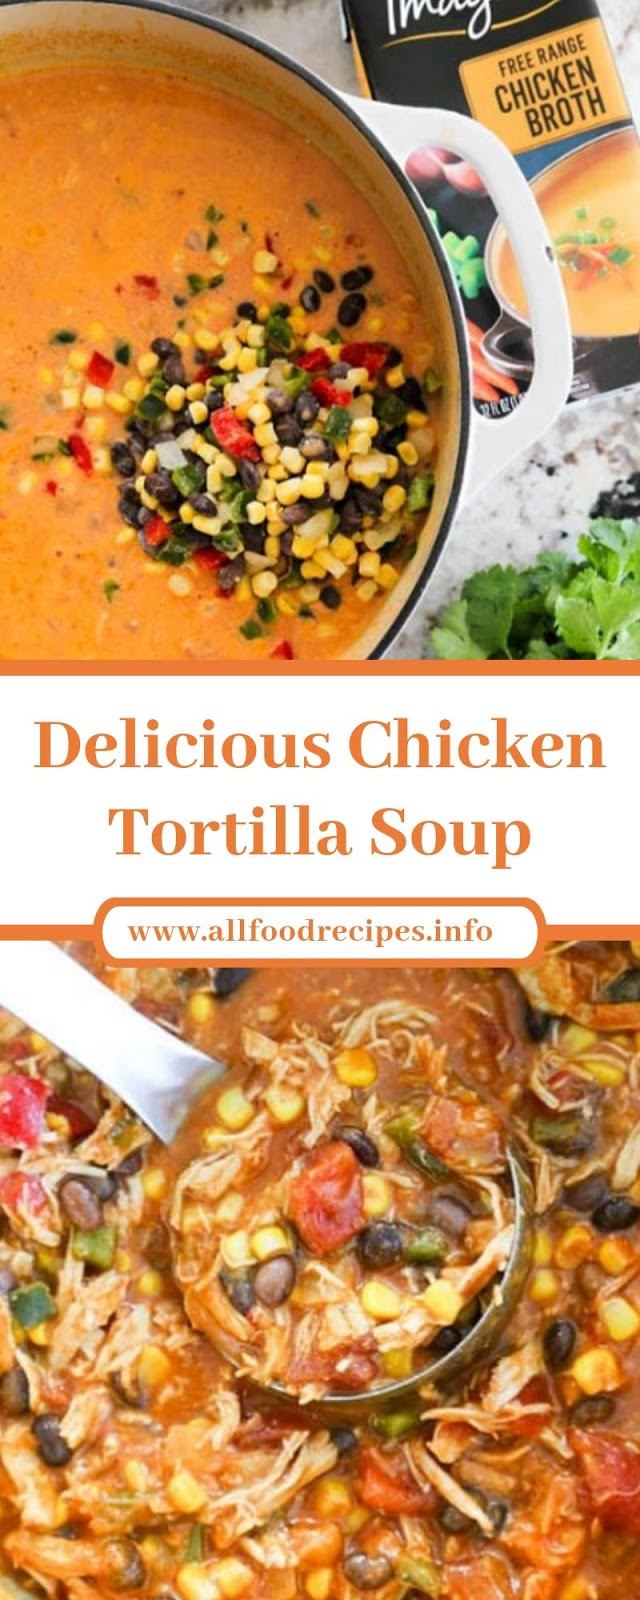 Delicious Chicken Tortilla Soup